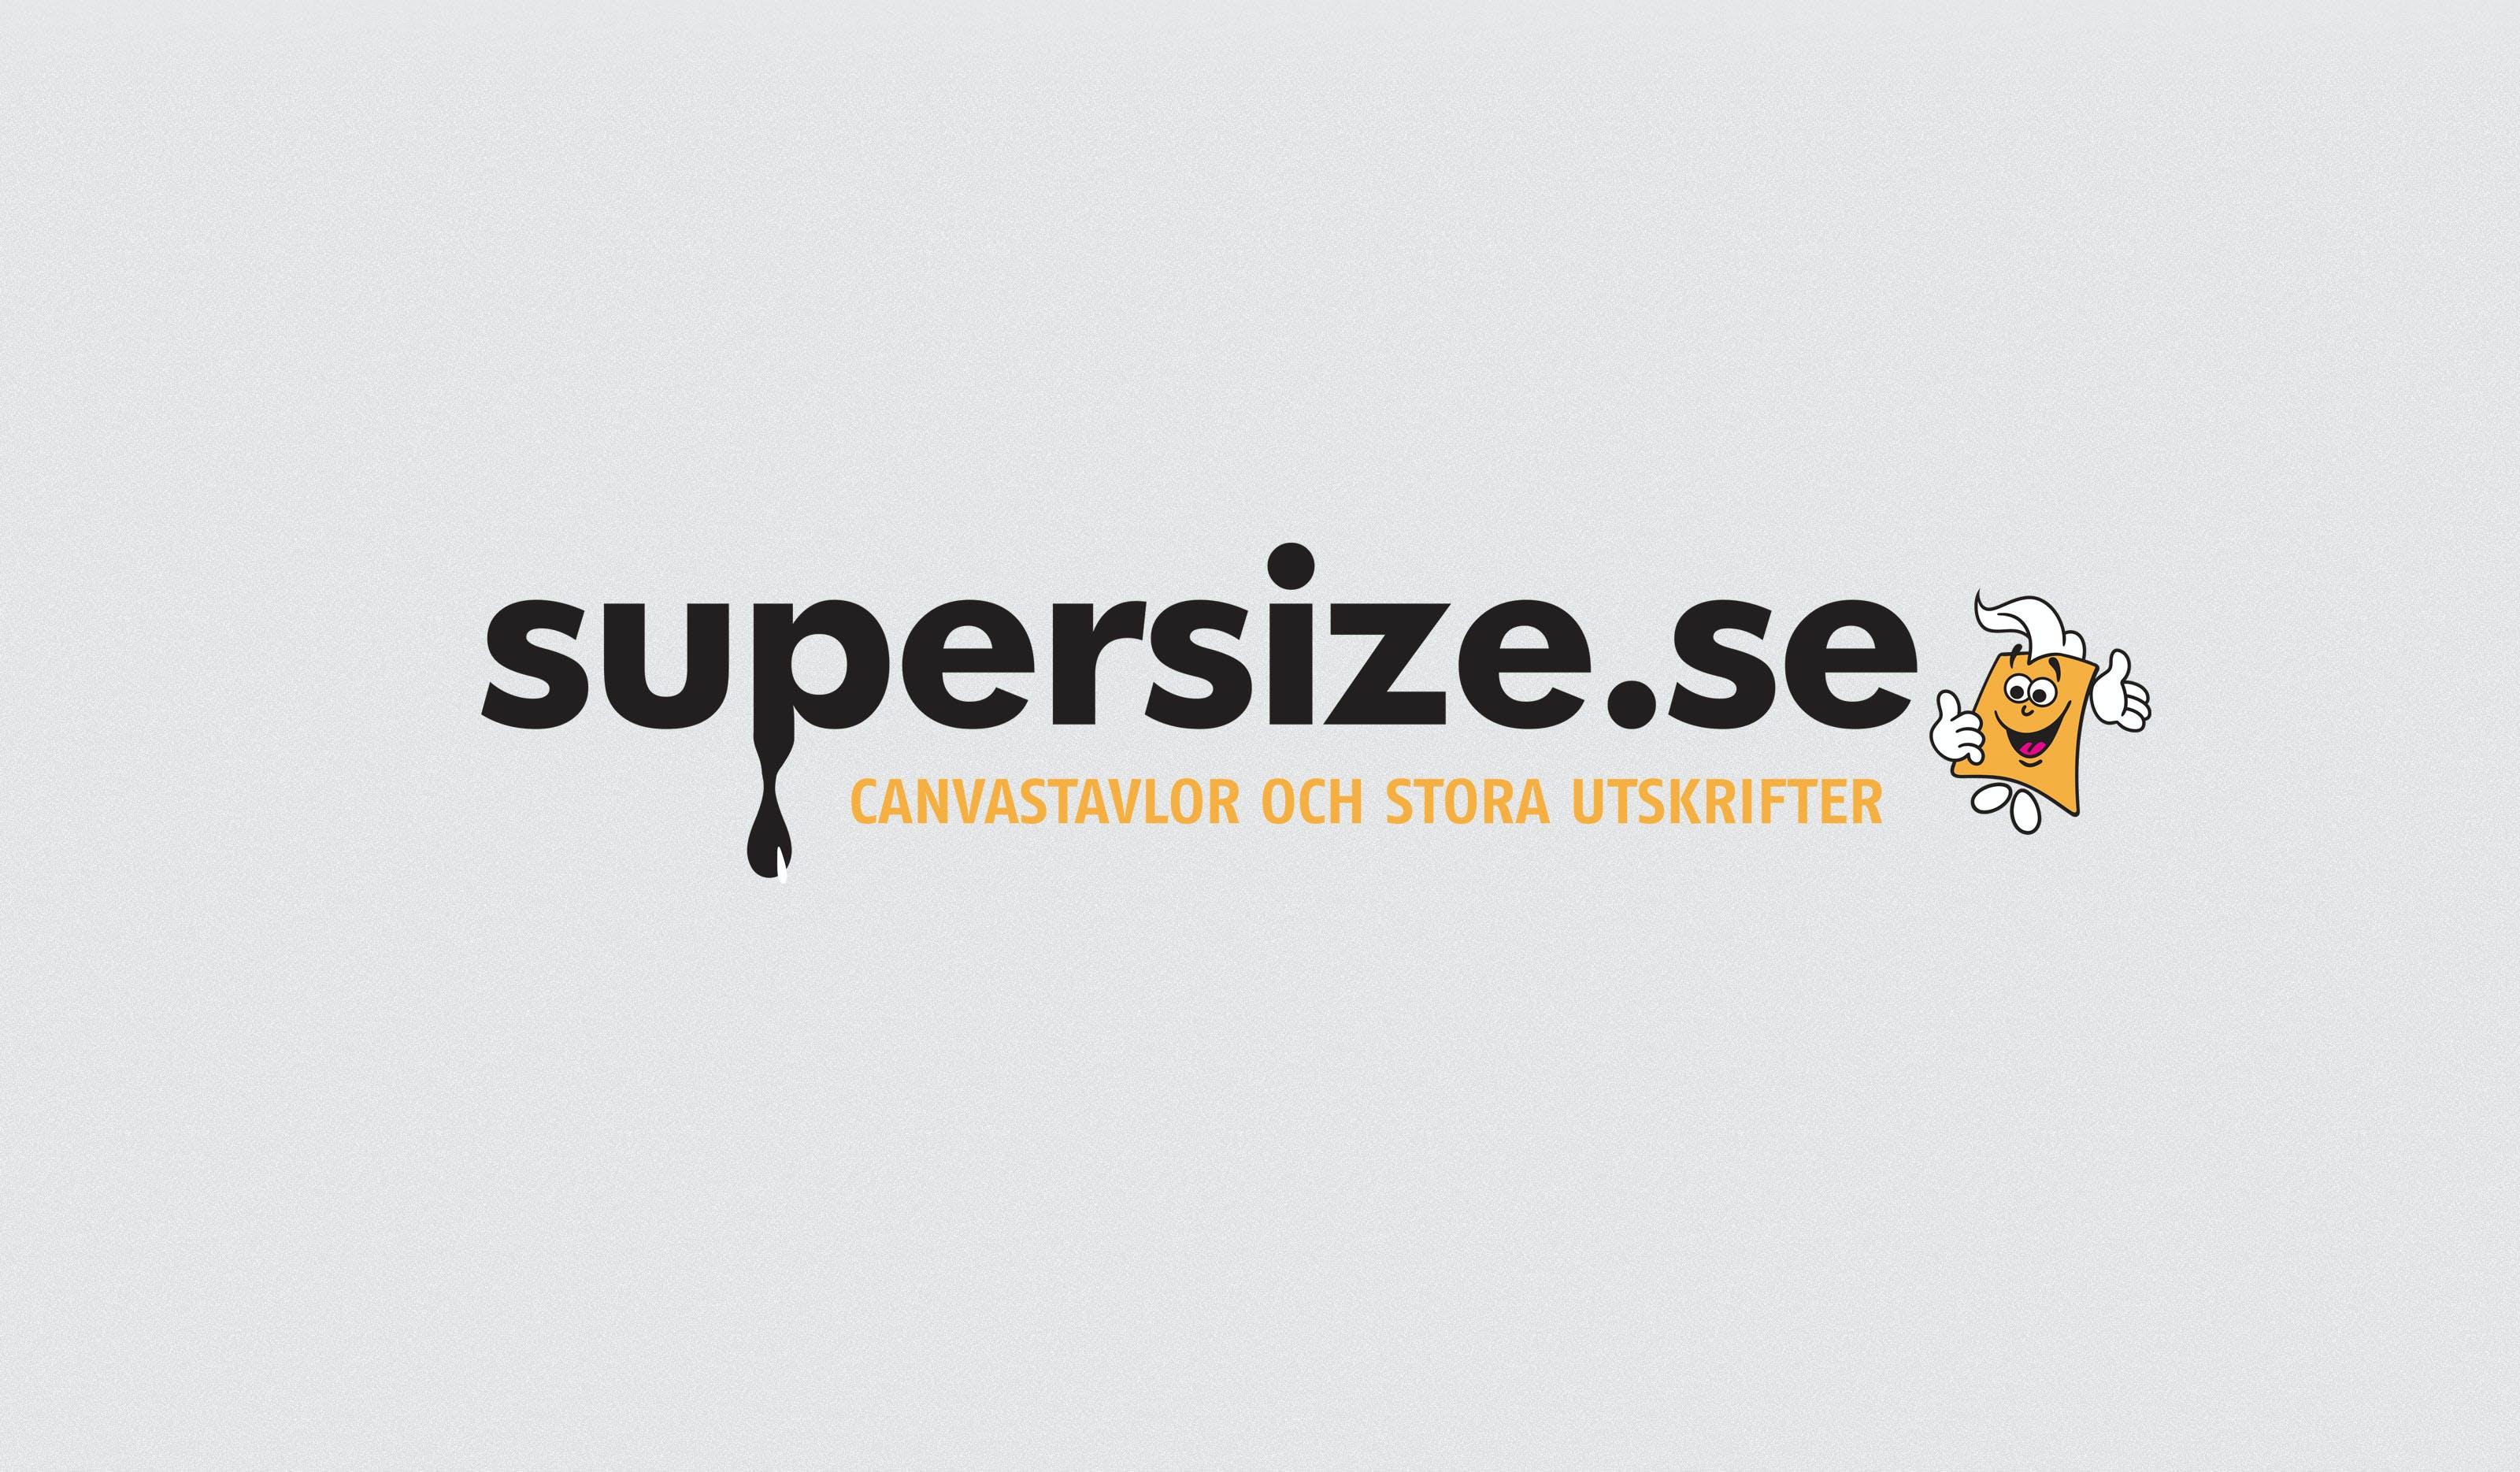 supersize.se logo